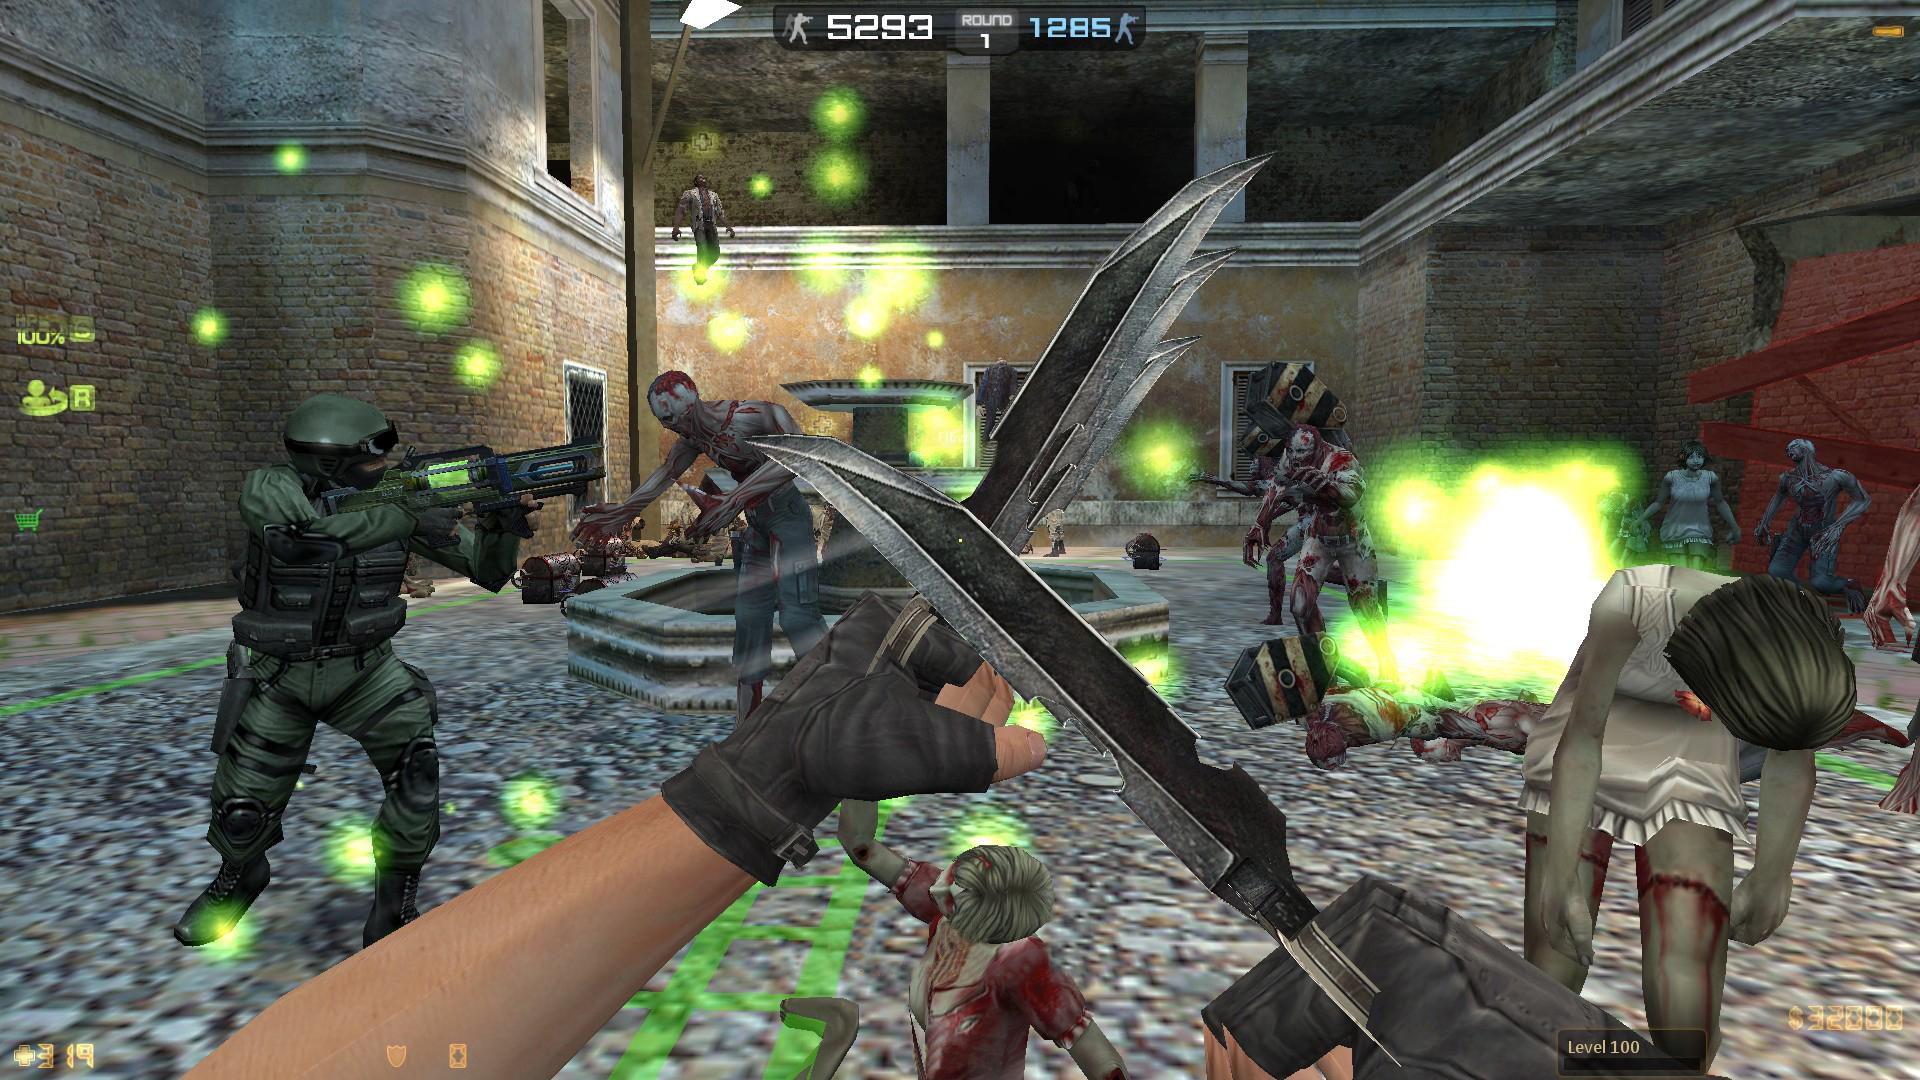 counter strike global offensive download pc completo gratis baixaki